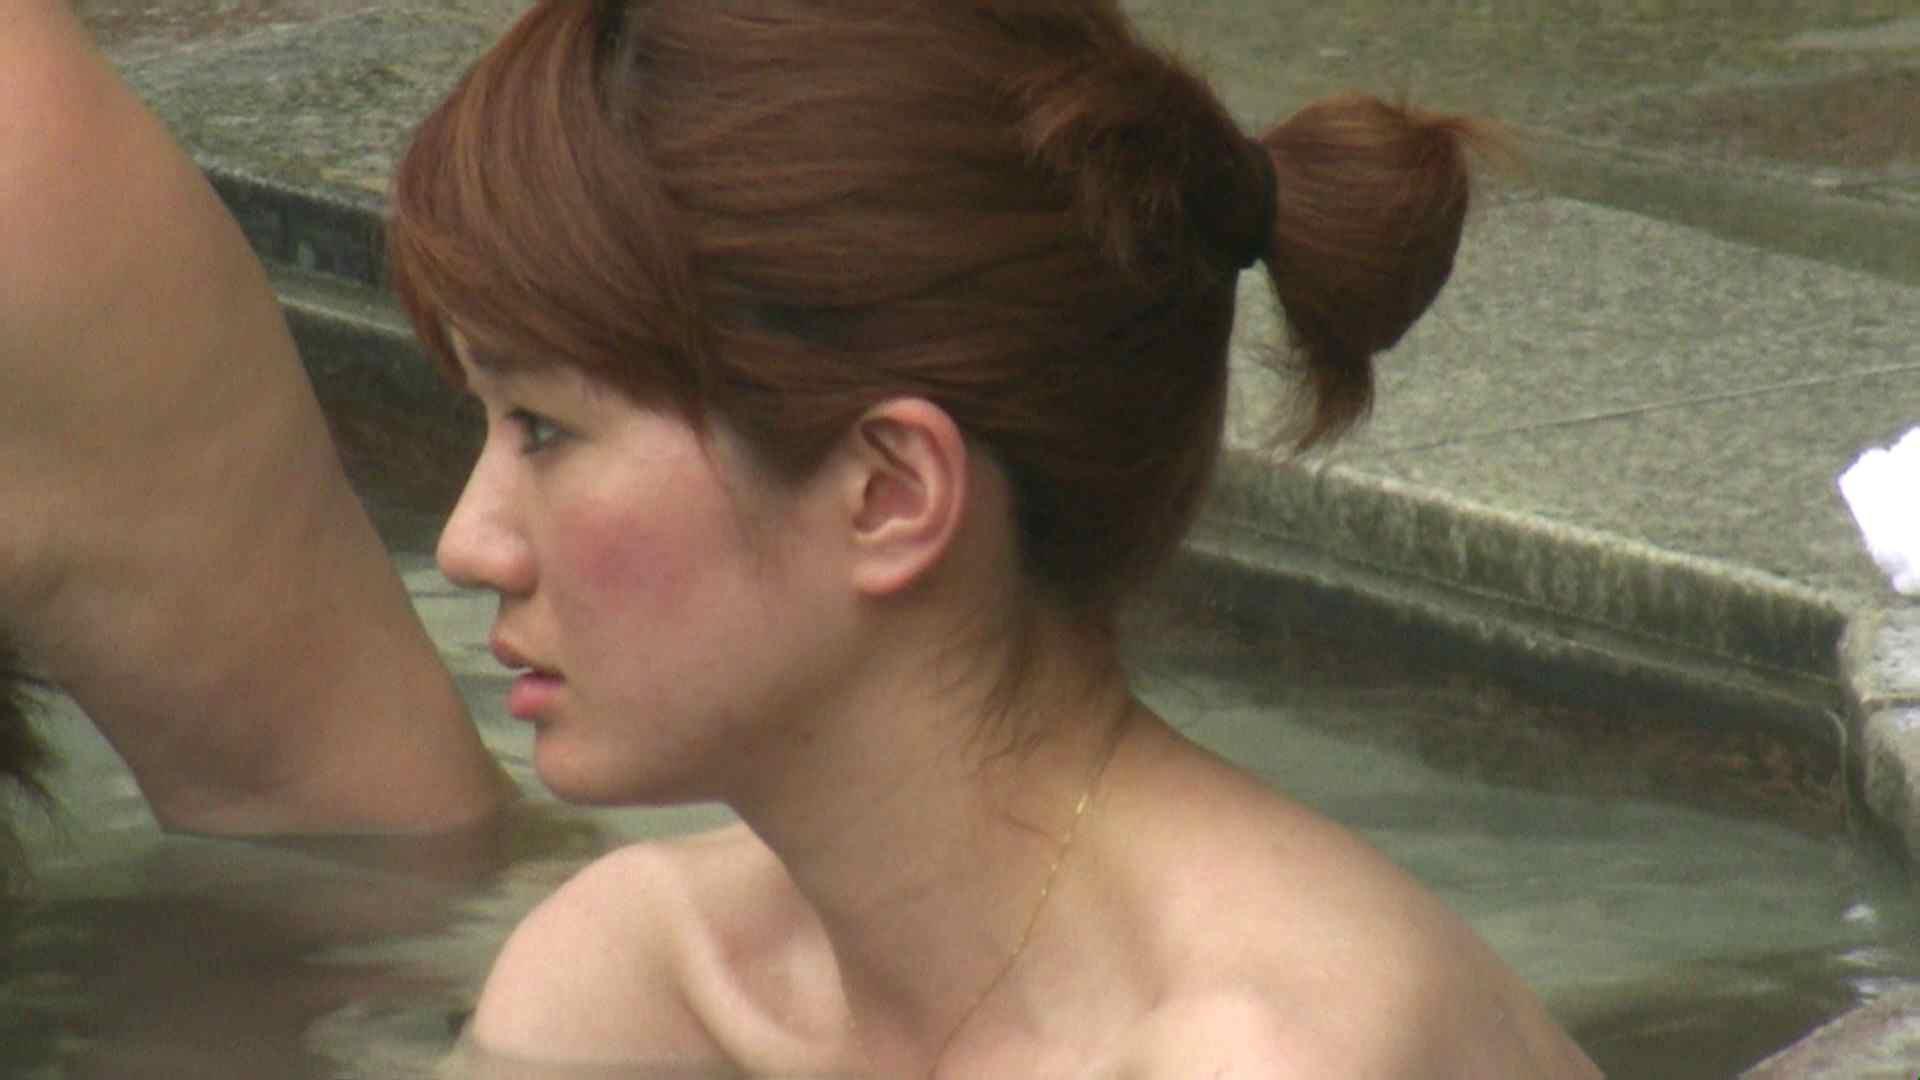 Aquaな露天風呂Vol.110 HなOL | 盗撮  71pic 51